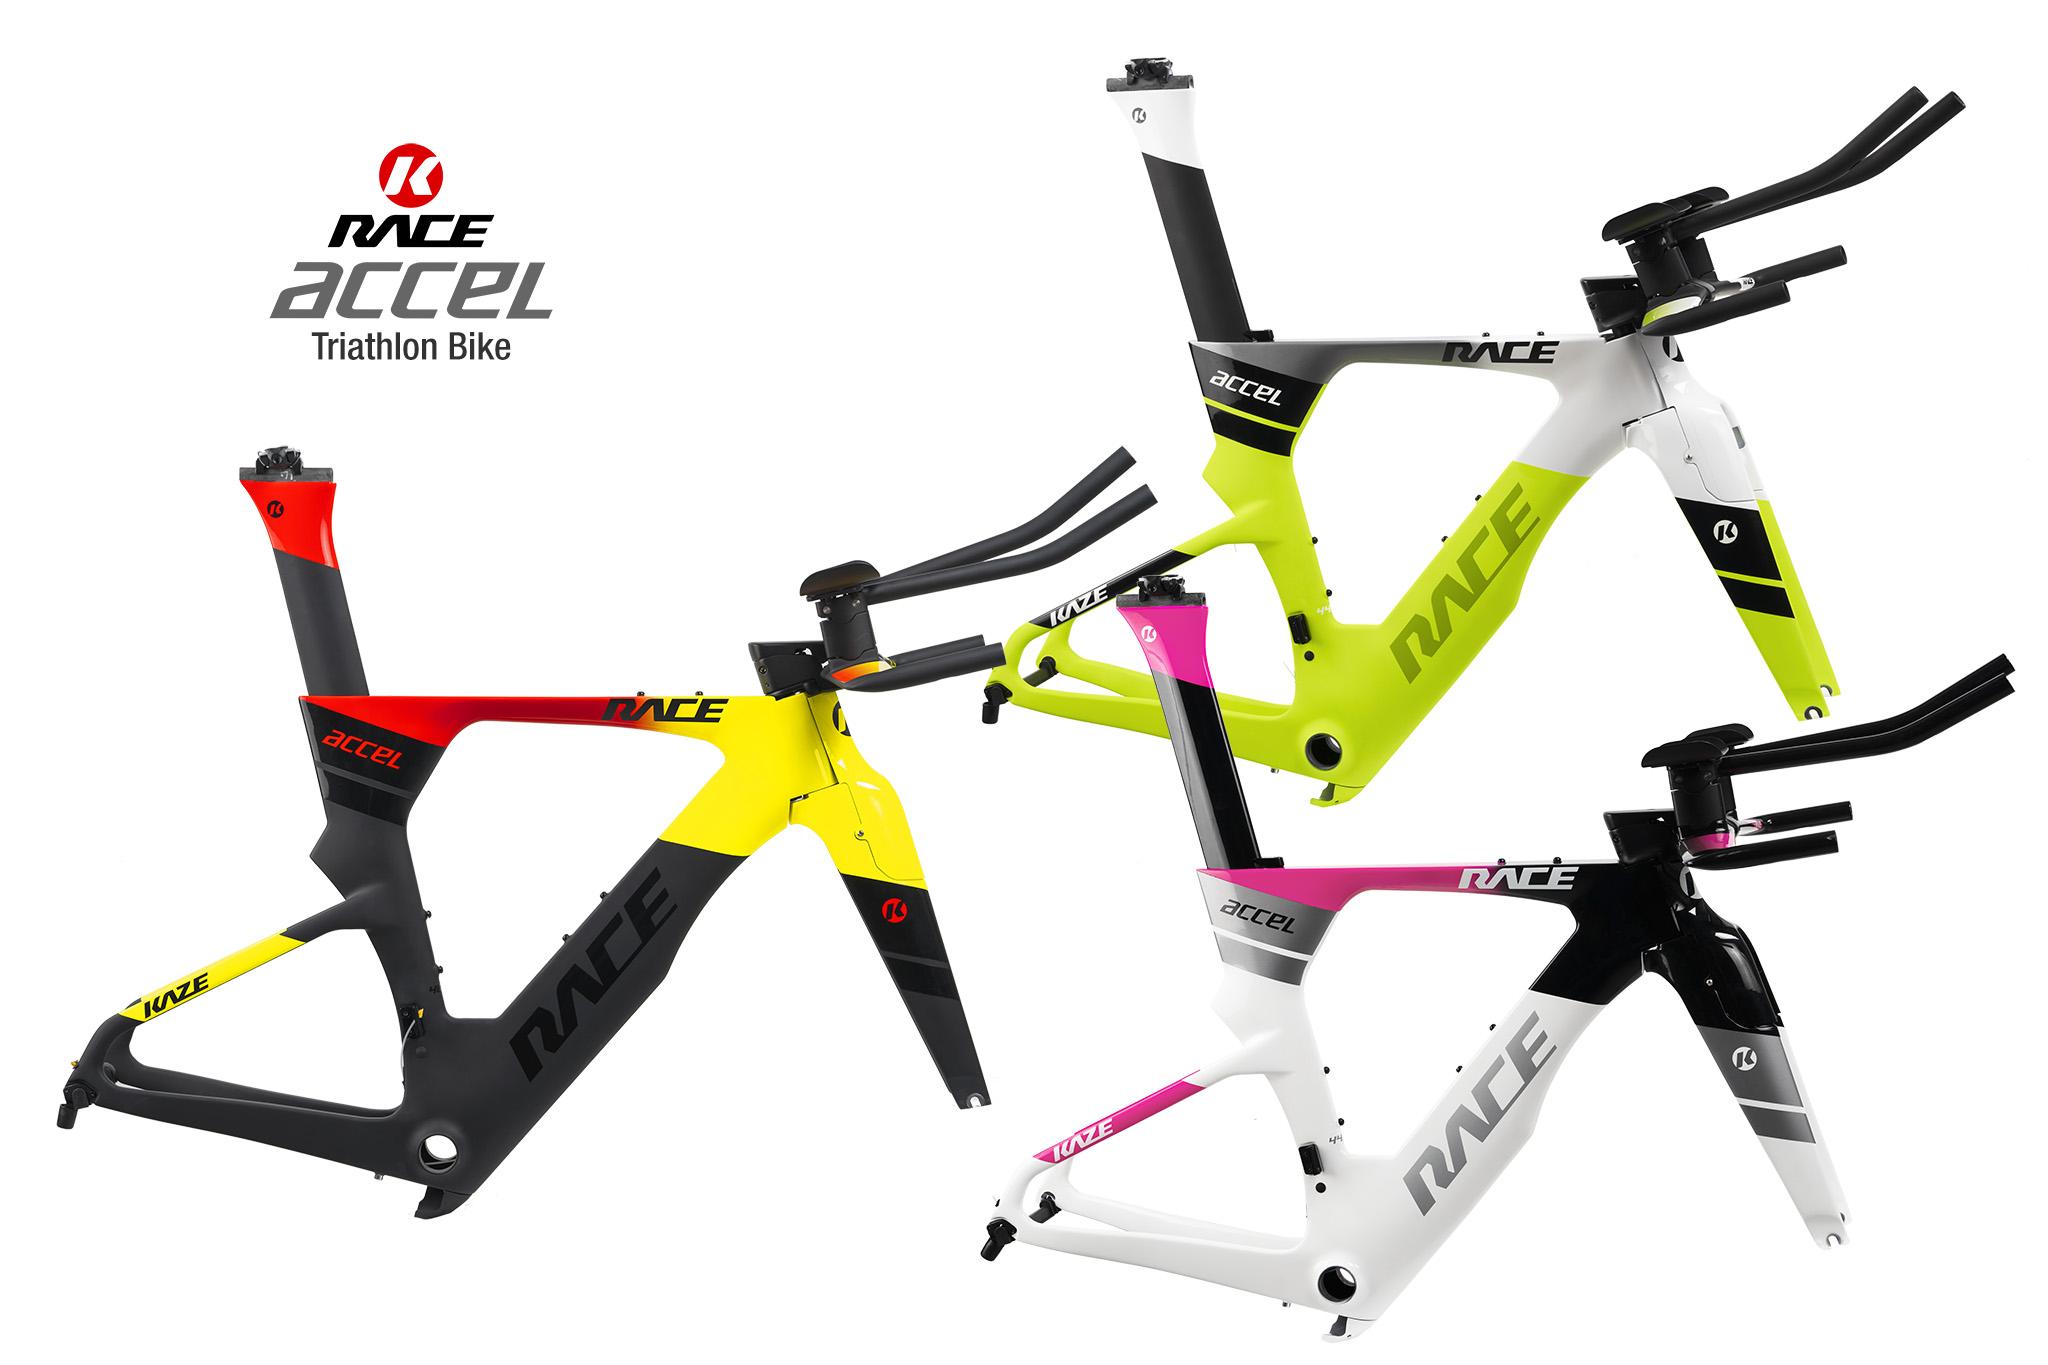 KAZE RACE | ACCEL (Triathlon frame set)